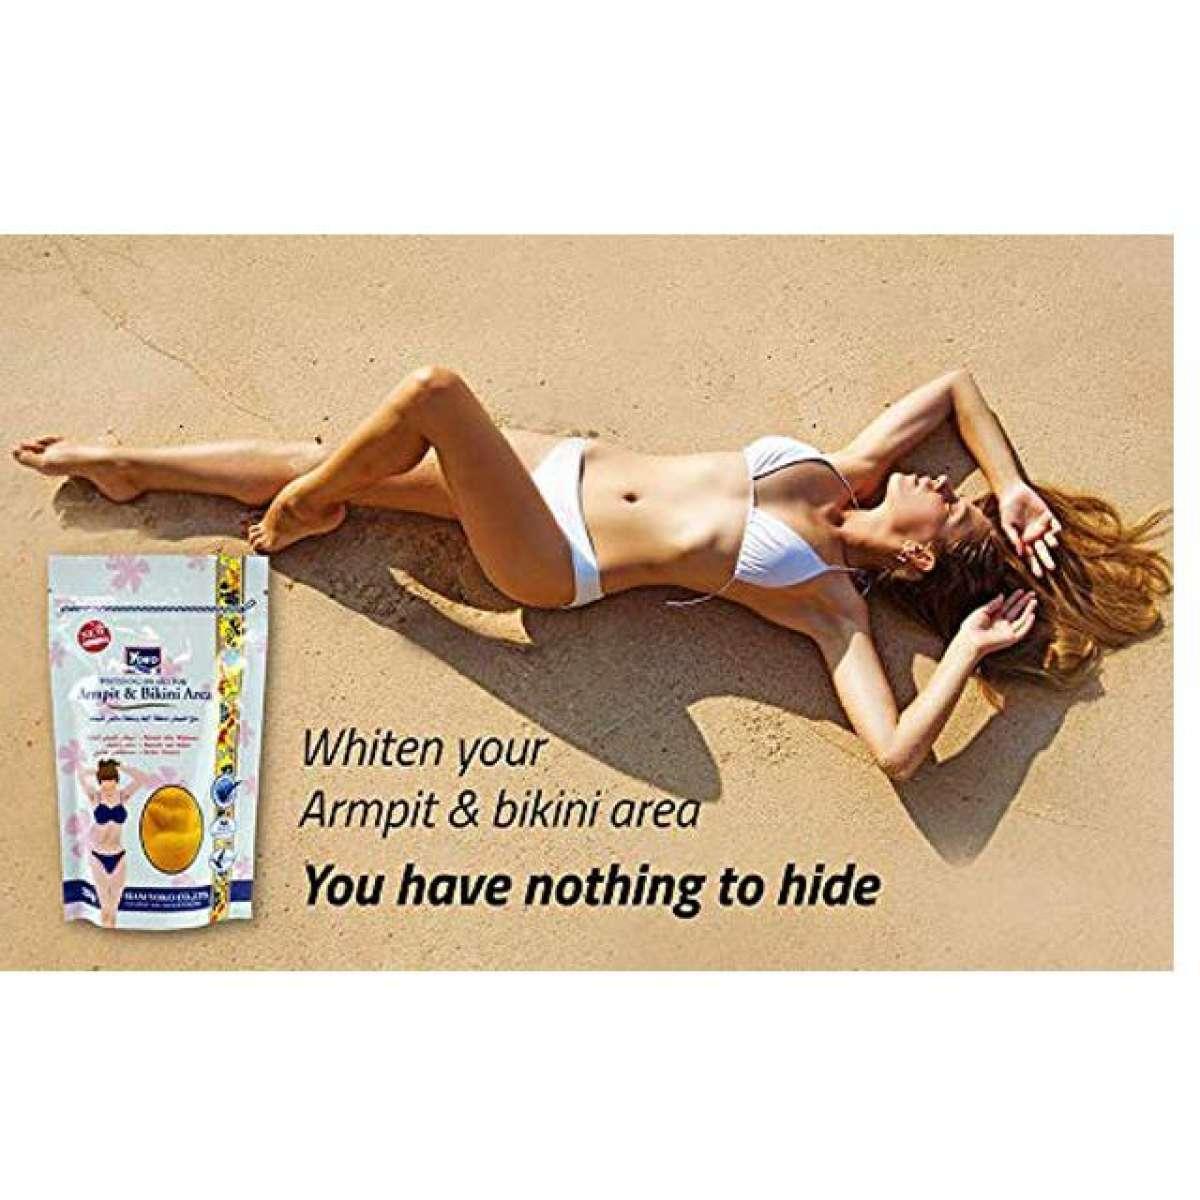 Bikini Salt Whitening Spa Salt For Armpit & Bikini Area 220g.(Different Flavors)